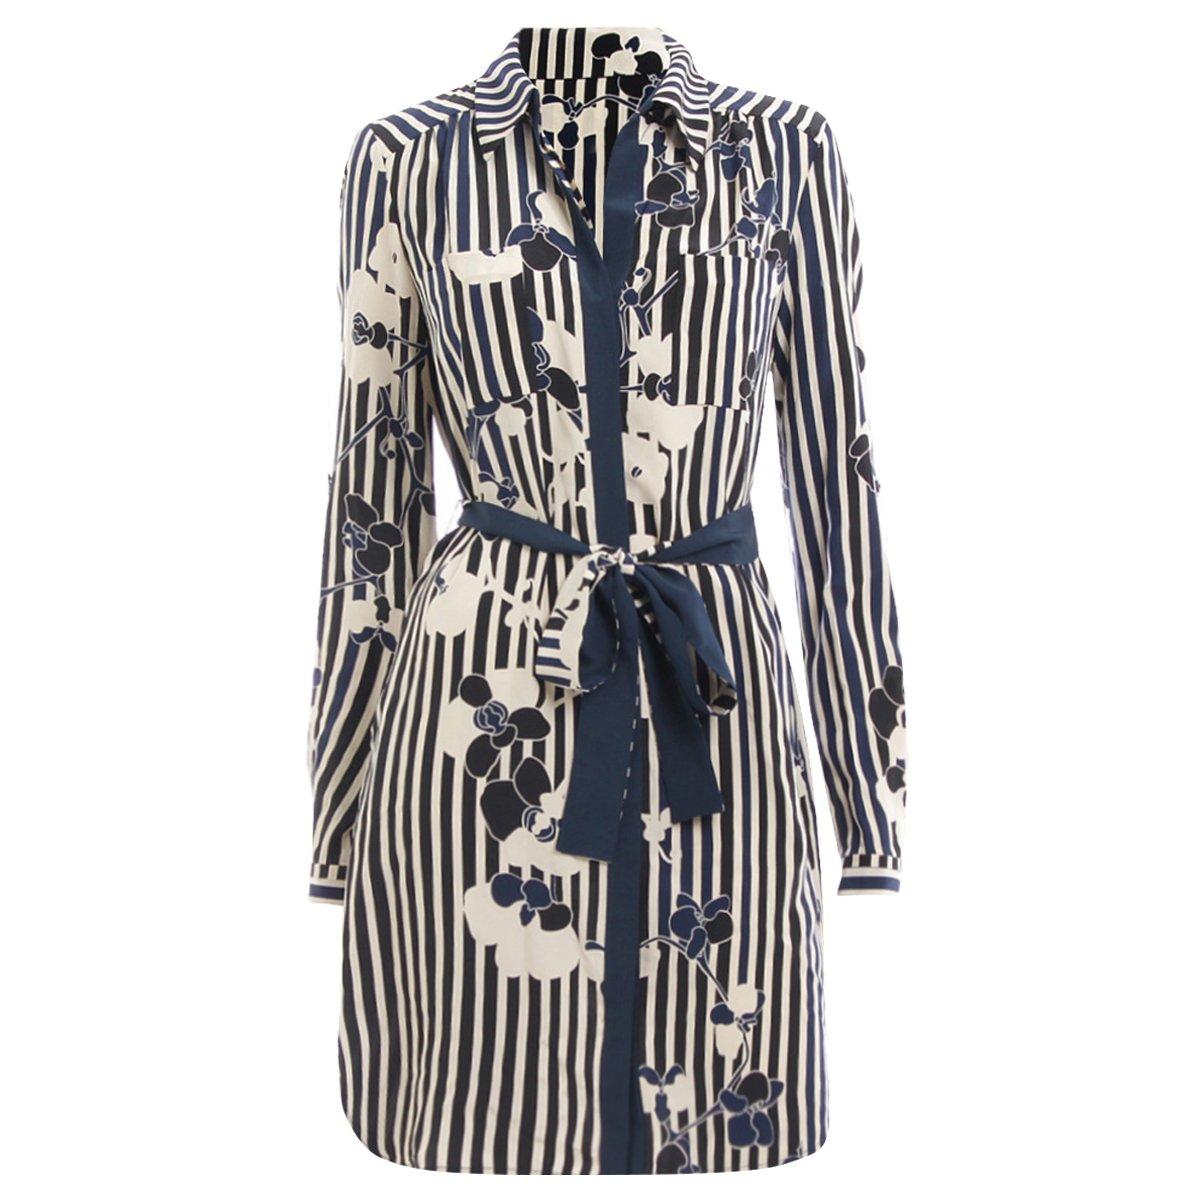 7ab7eebdfbcb08 ... Diane Von Furstenberg Navy Blue Striped Floral Print Shirt Dress S.  nextprev. prevnext